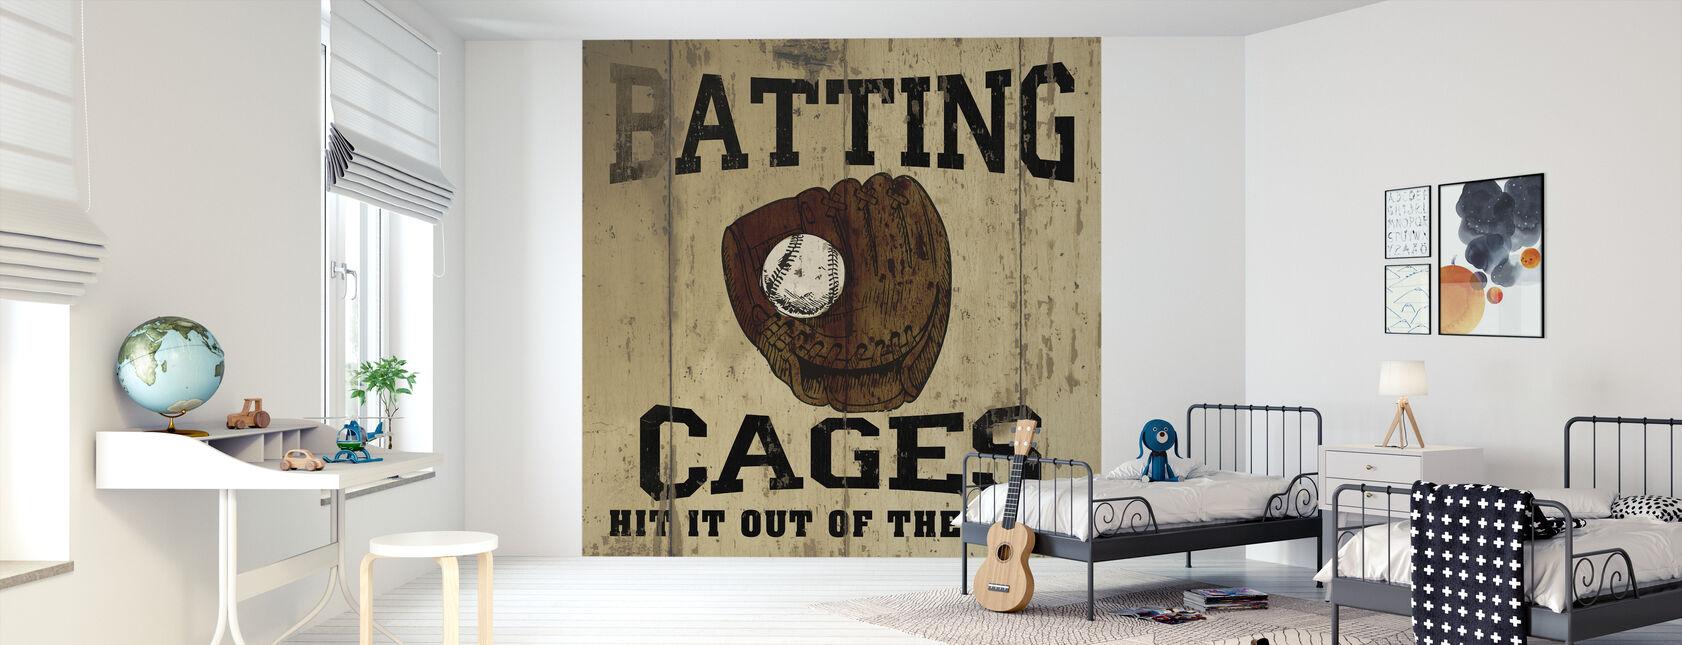 Batting kooien - Behang - Kinderkamer